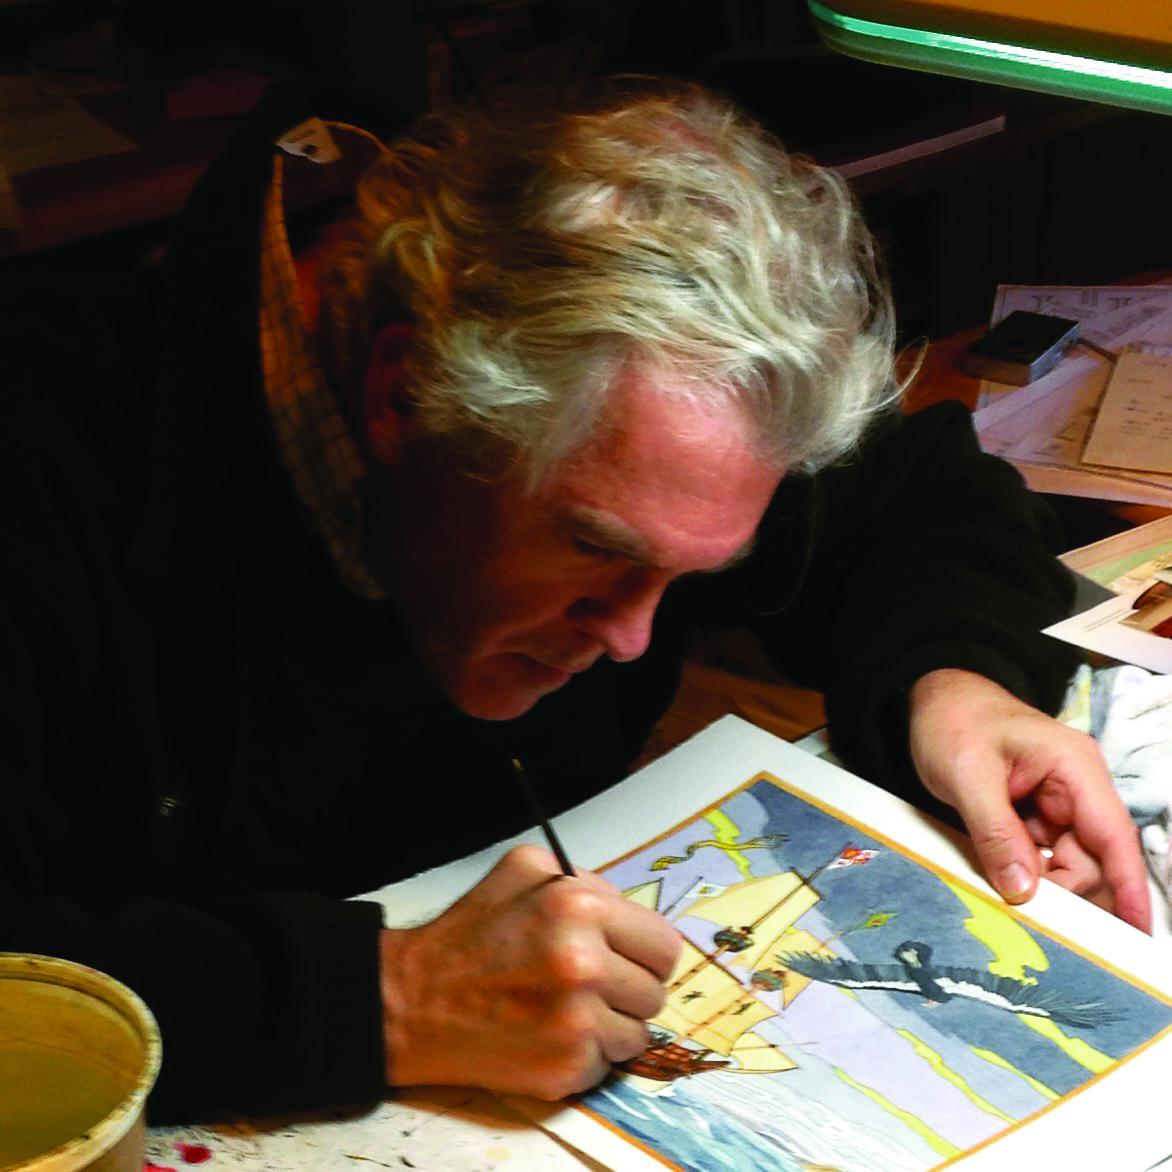 Doug Hansen working on an illustration, image courtesy of Nat Hansen